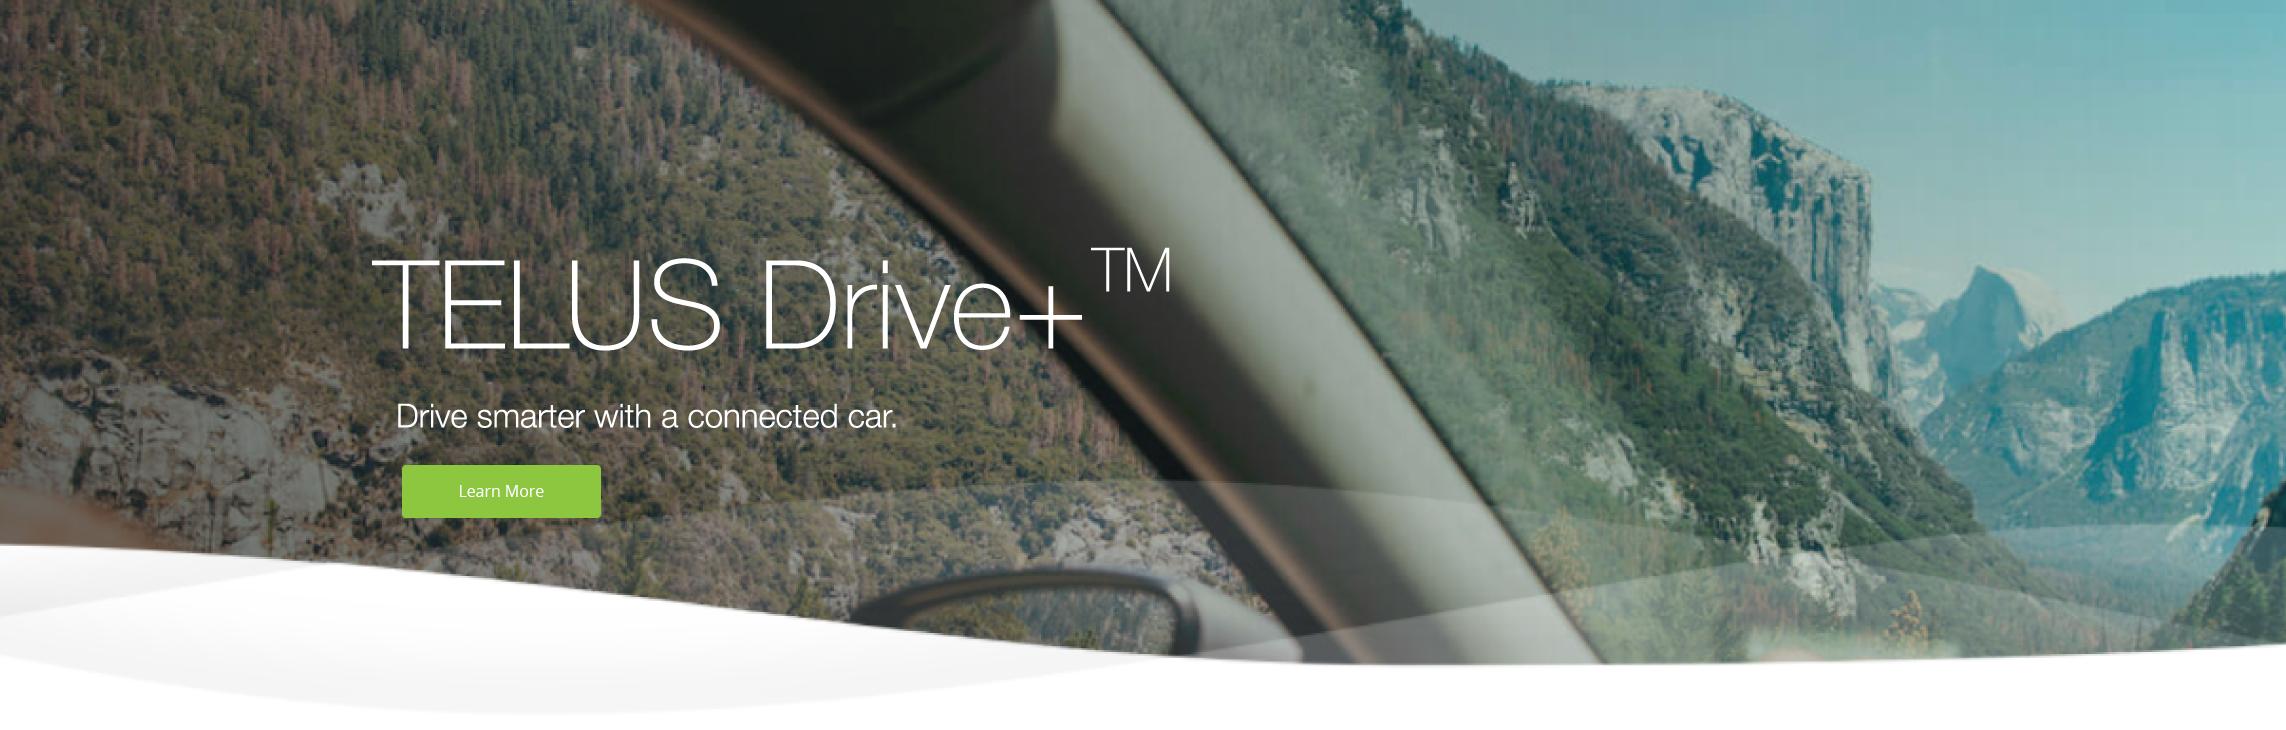 TELUS Drive+